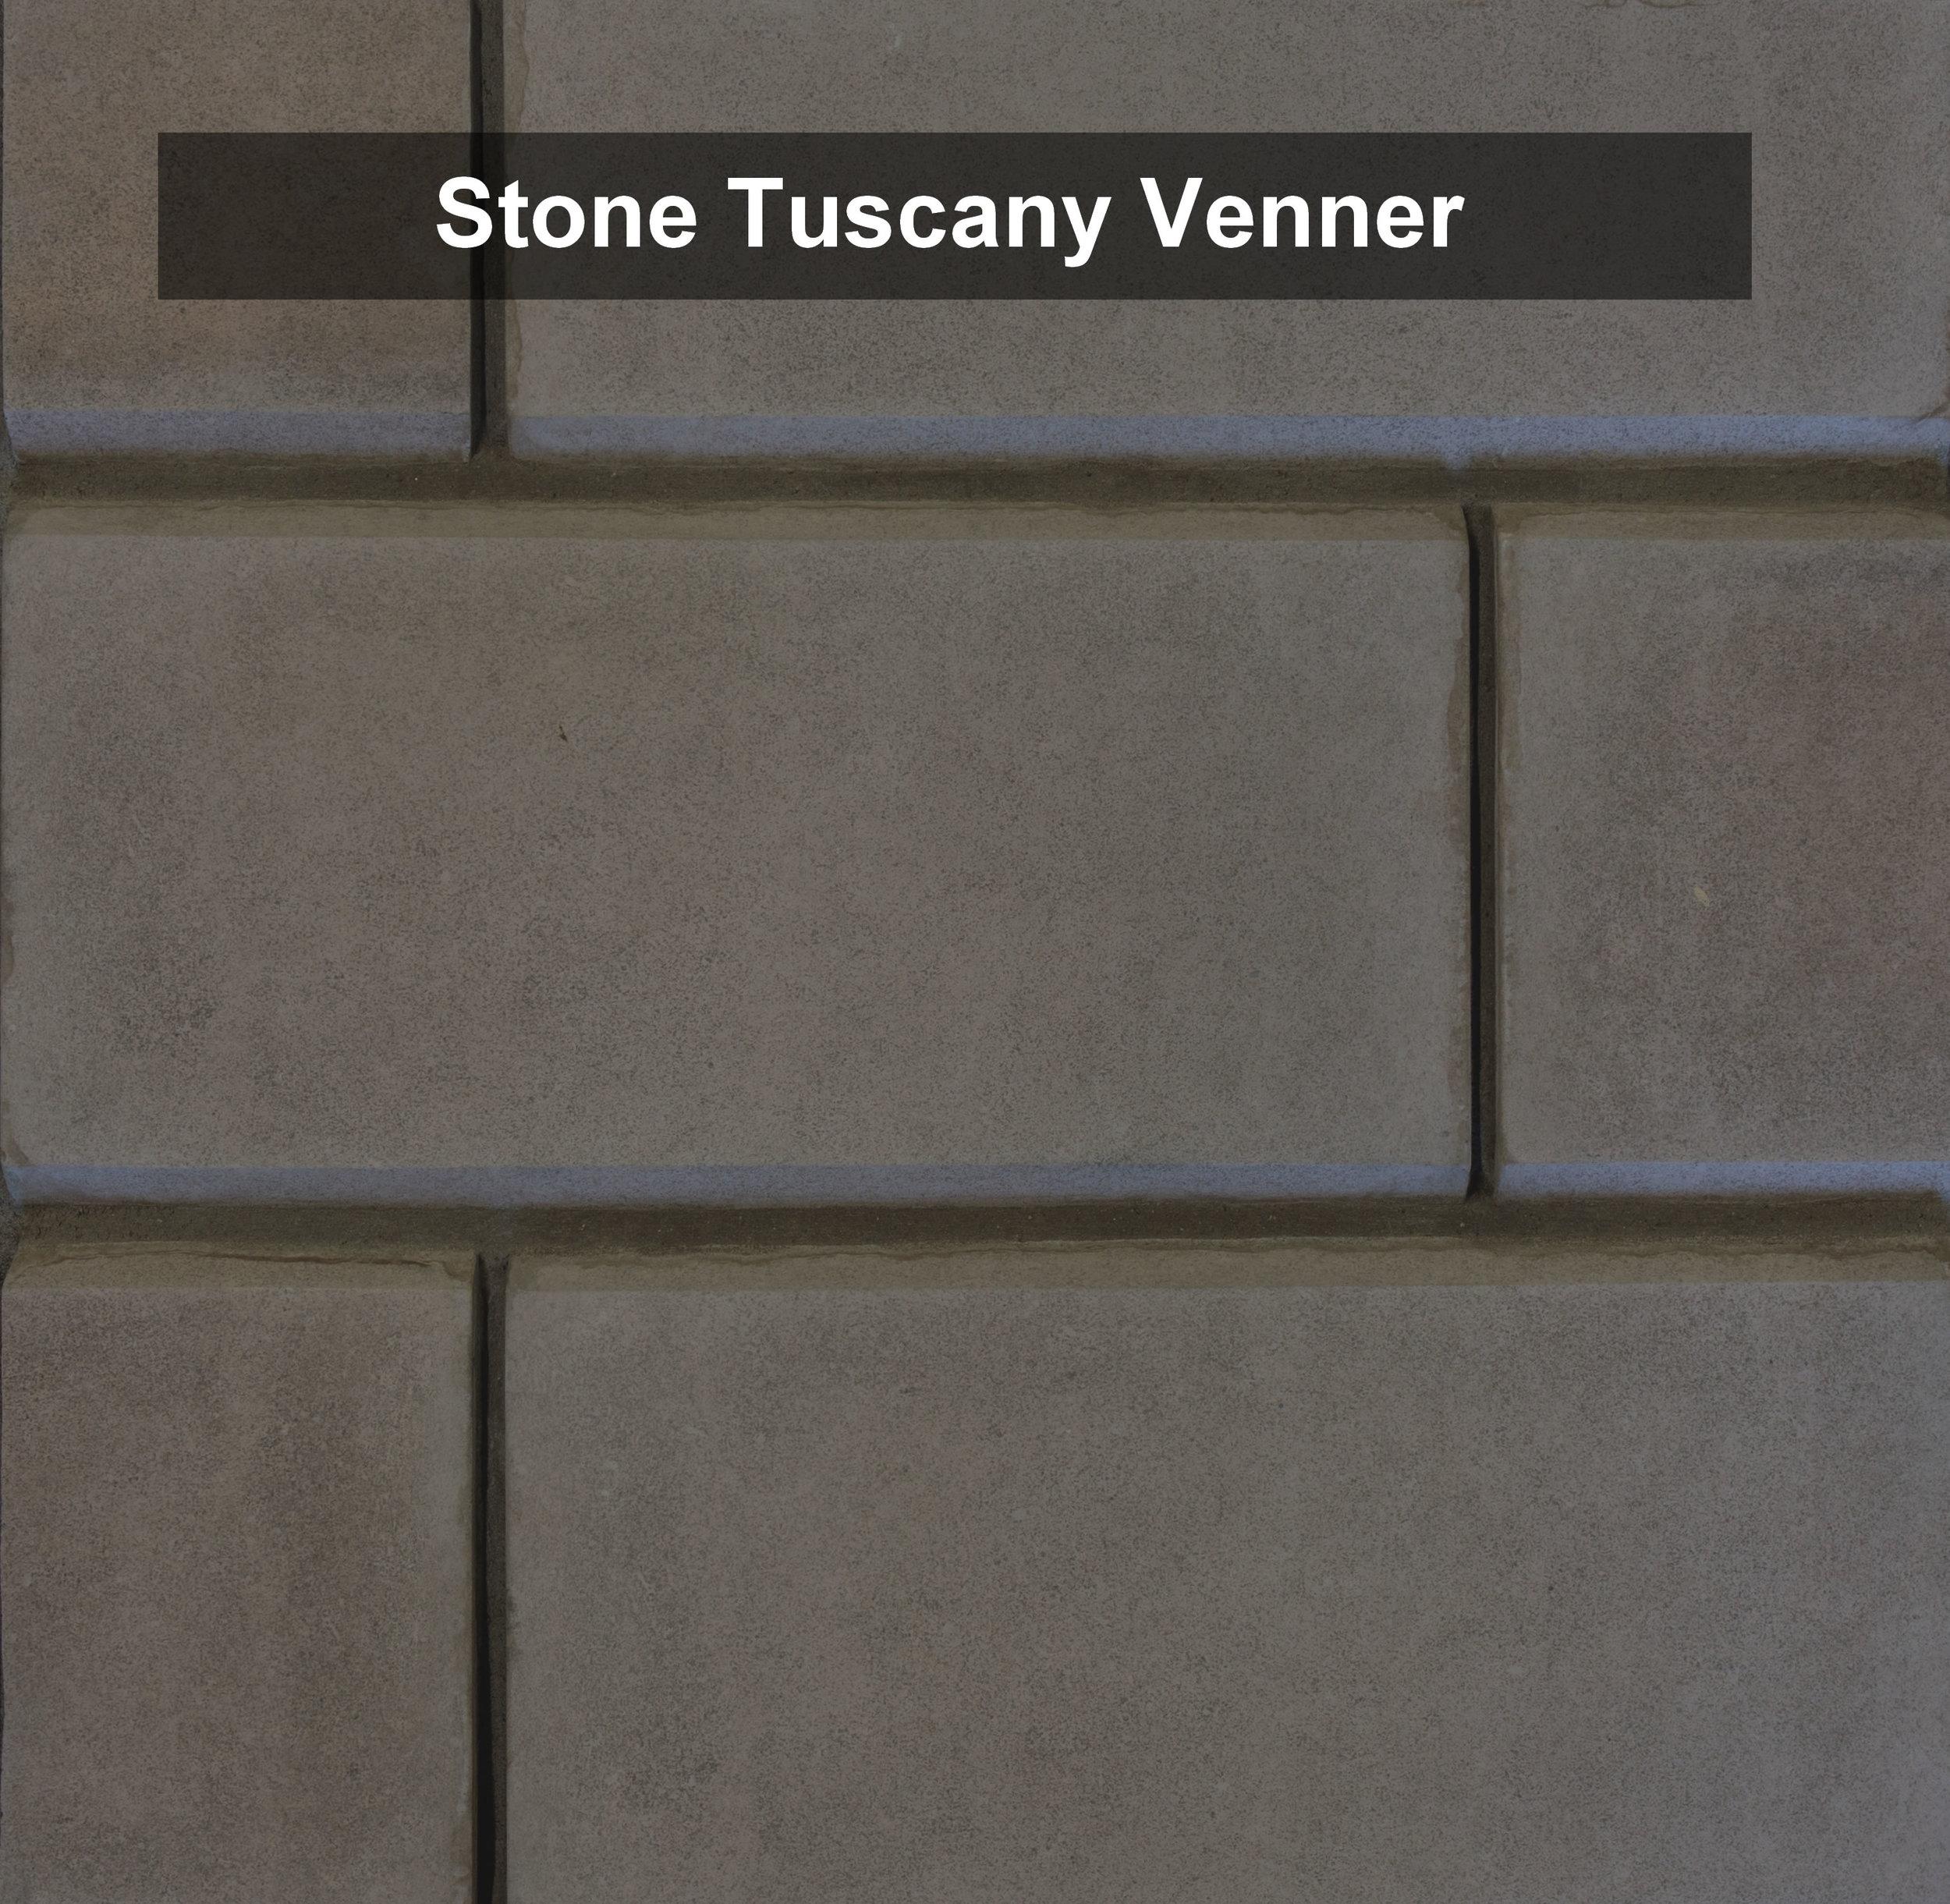 DQ_Tuscany Venner_Stone_Profile.jpg